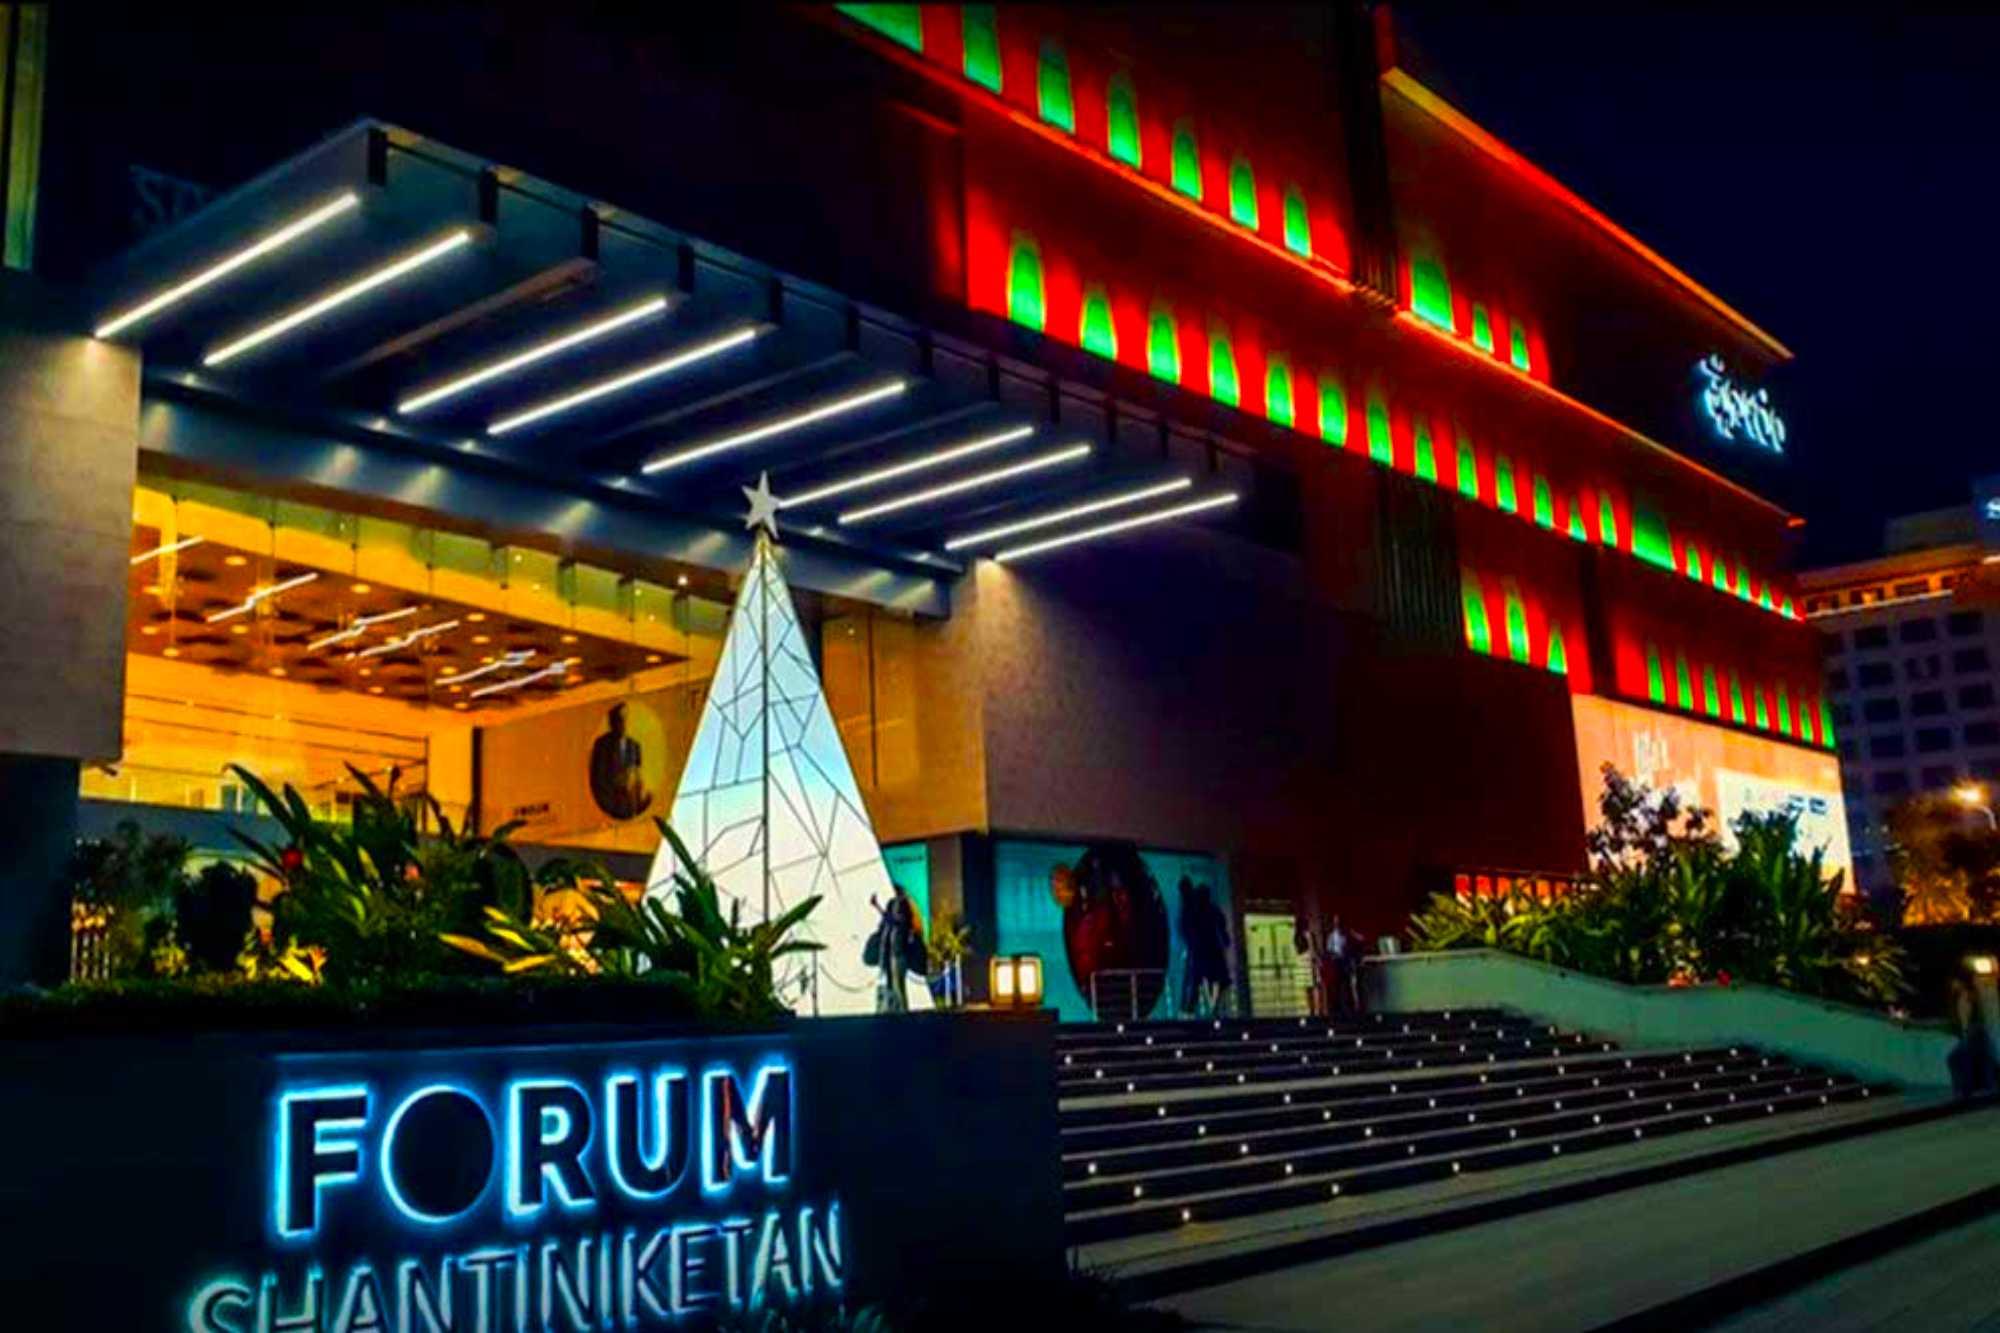 Forum Shantiniketan Mall